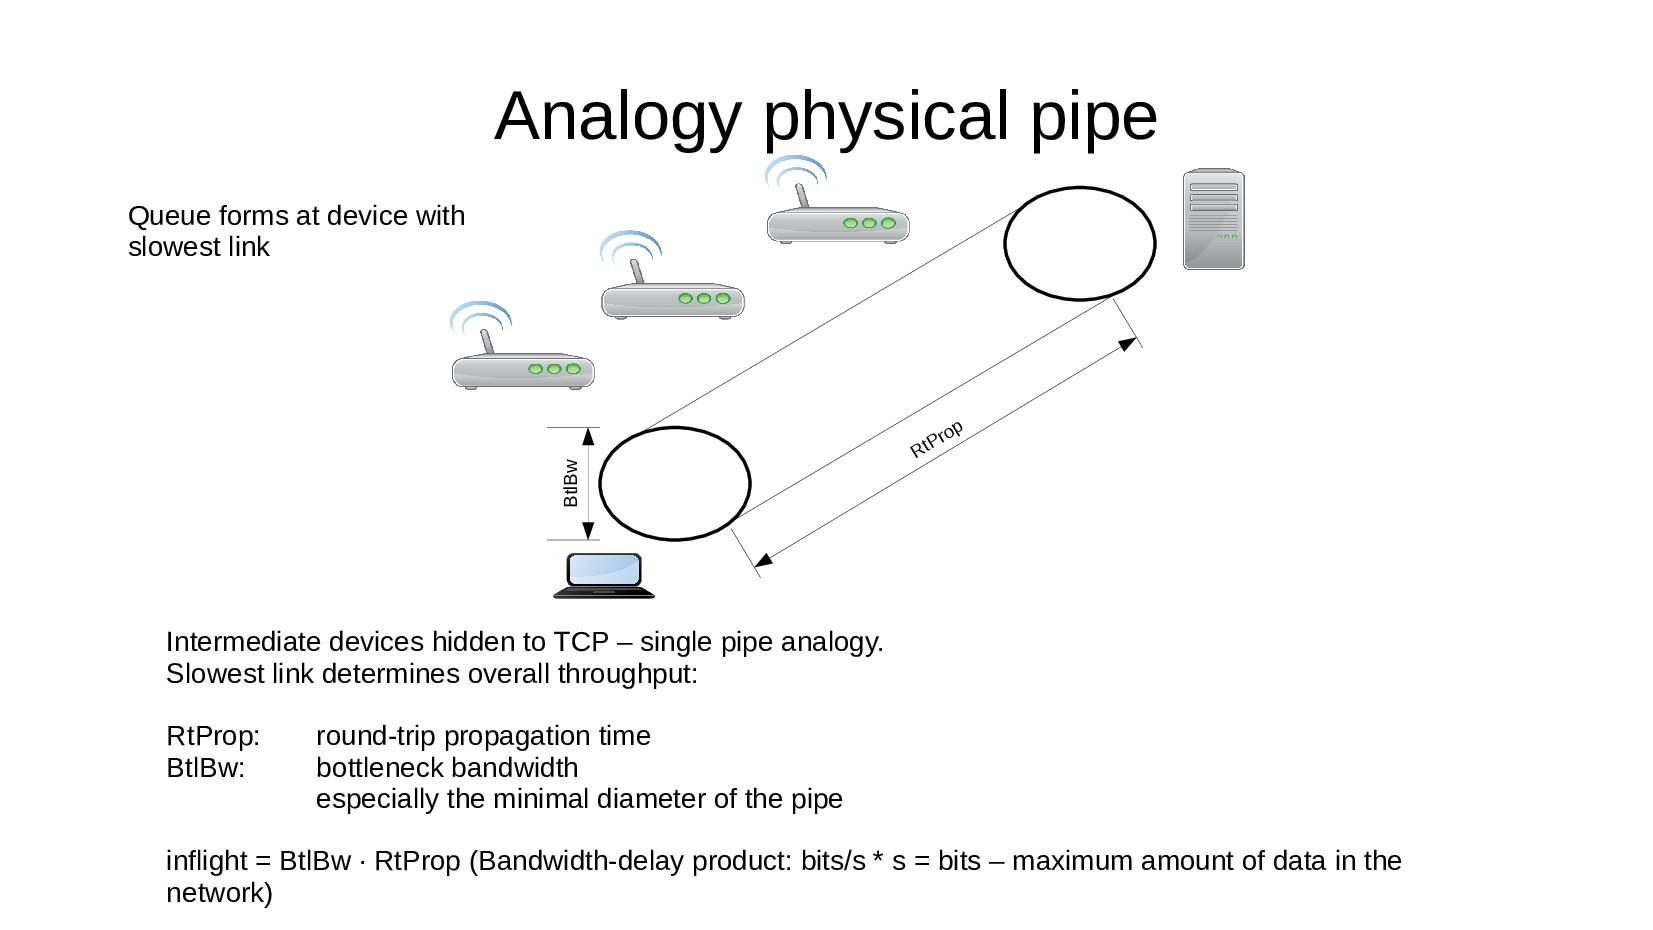 Analogy physical pipe BtlBw RtProp Intermediate...